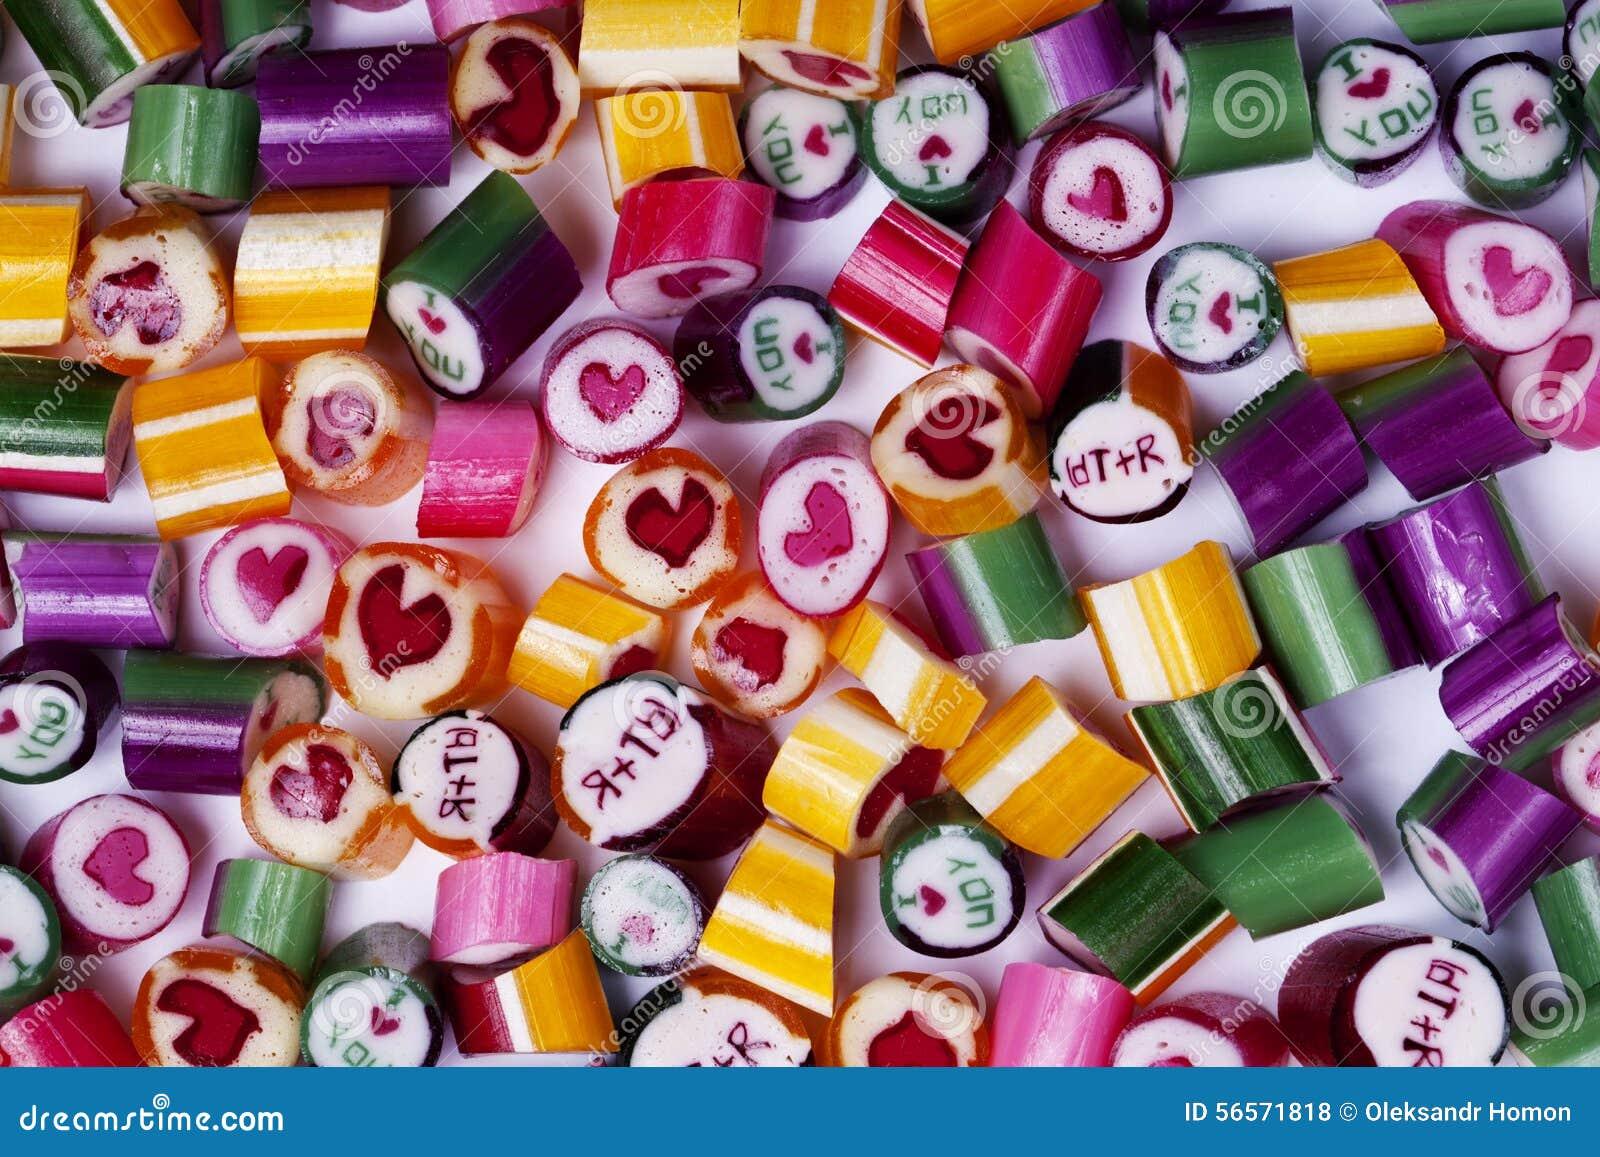 Download Φωτεινή καραμέλα καραμελών υποβάθρου Στοκ Εικόνες - εικόνα από τρόφιμα, arroyos: 56571818